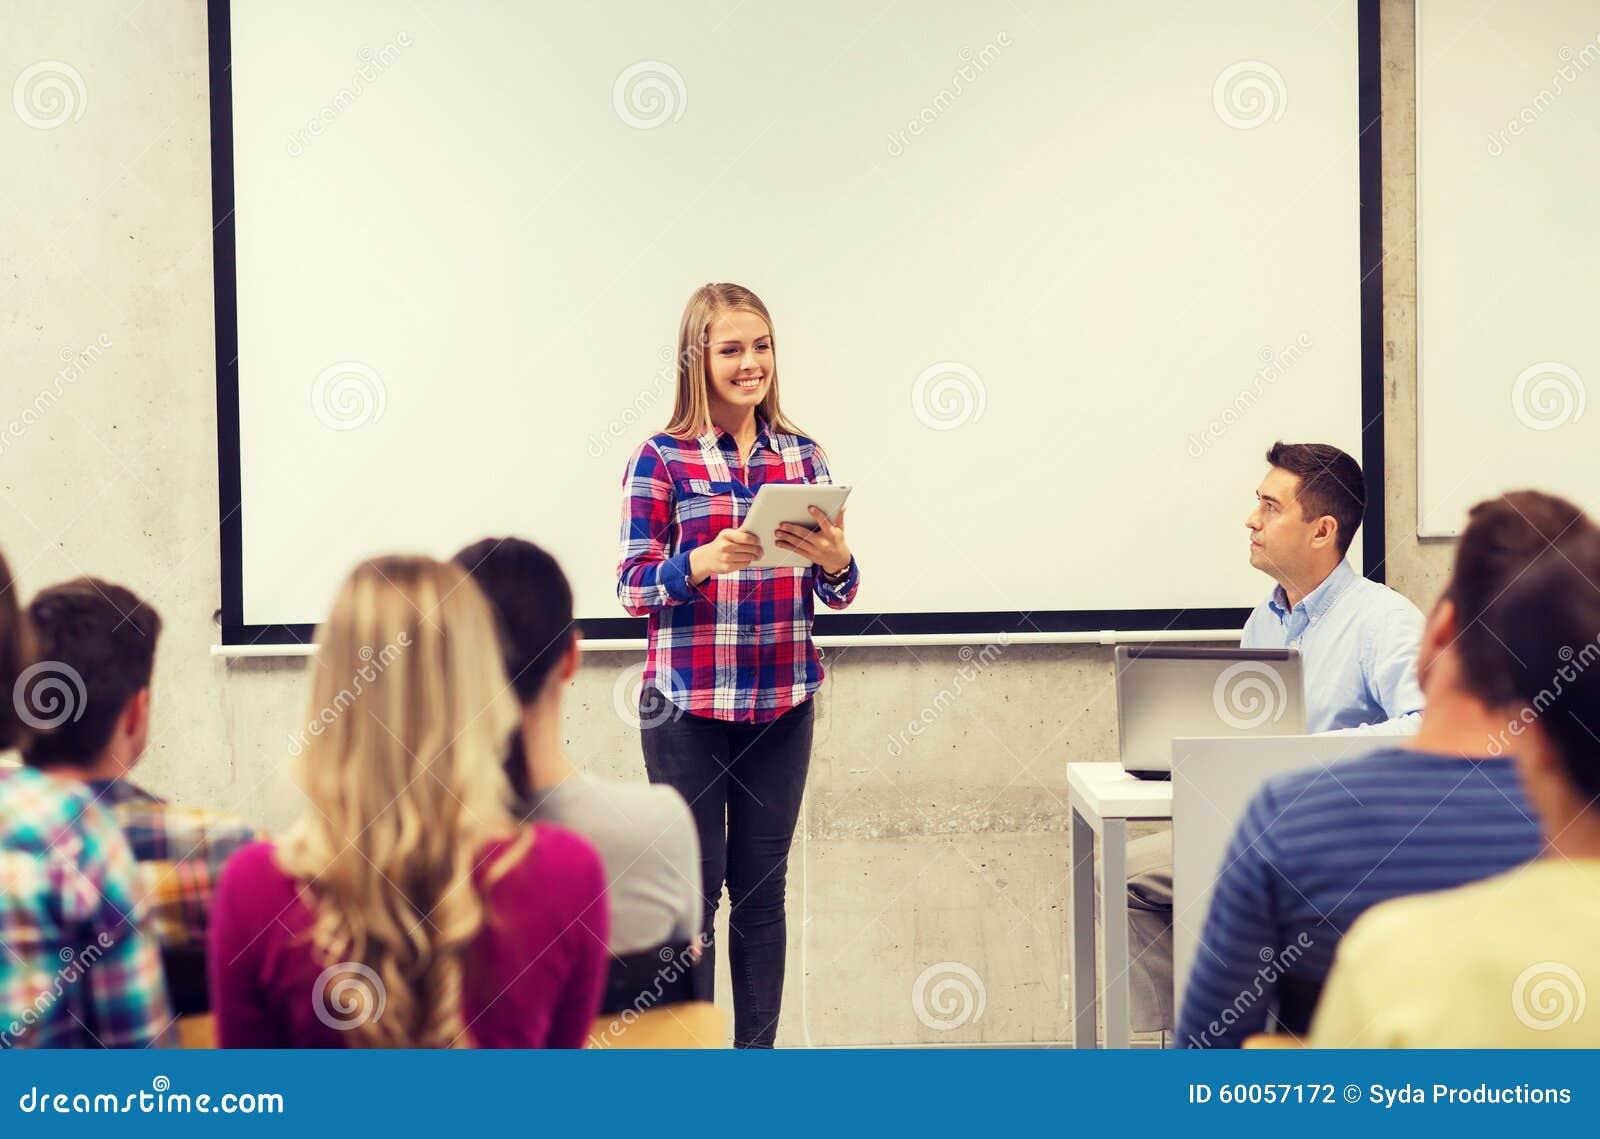 Teacher dating high school girl